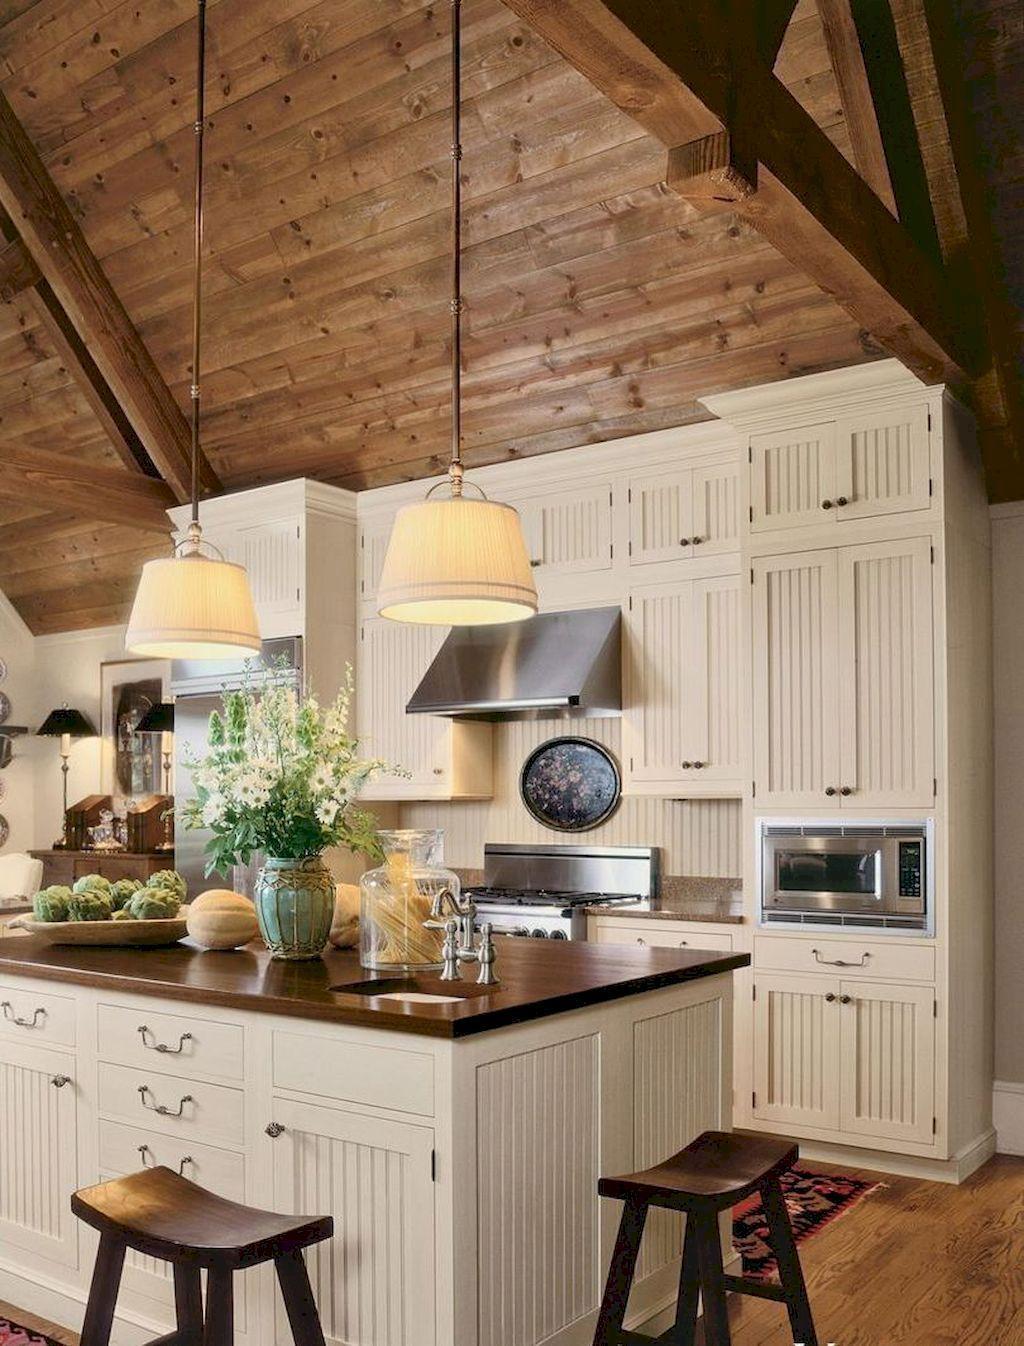 17 great kitchen island ideas photos and galleries home decor rh pinterest com